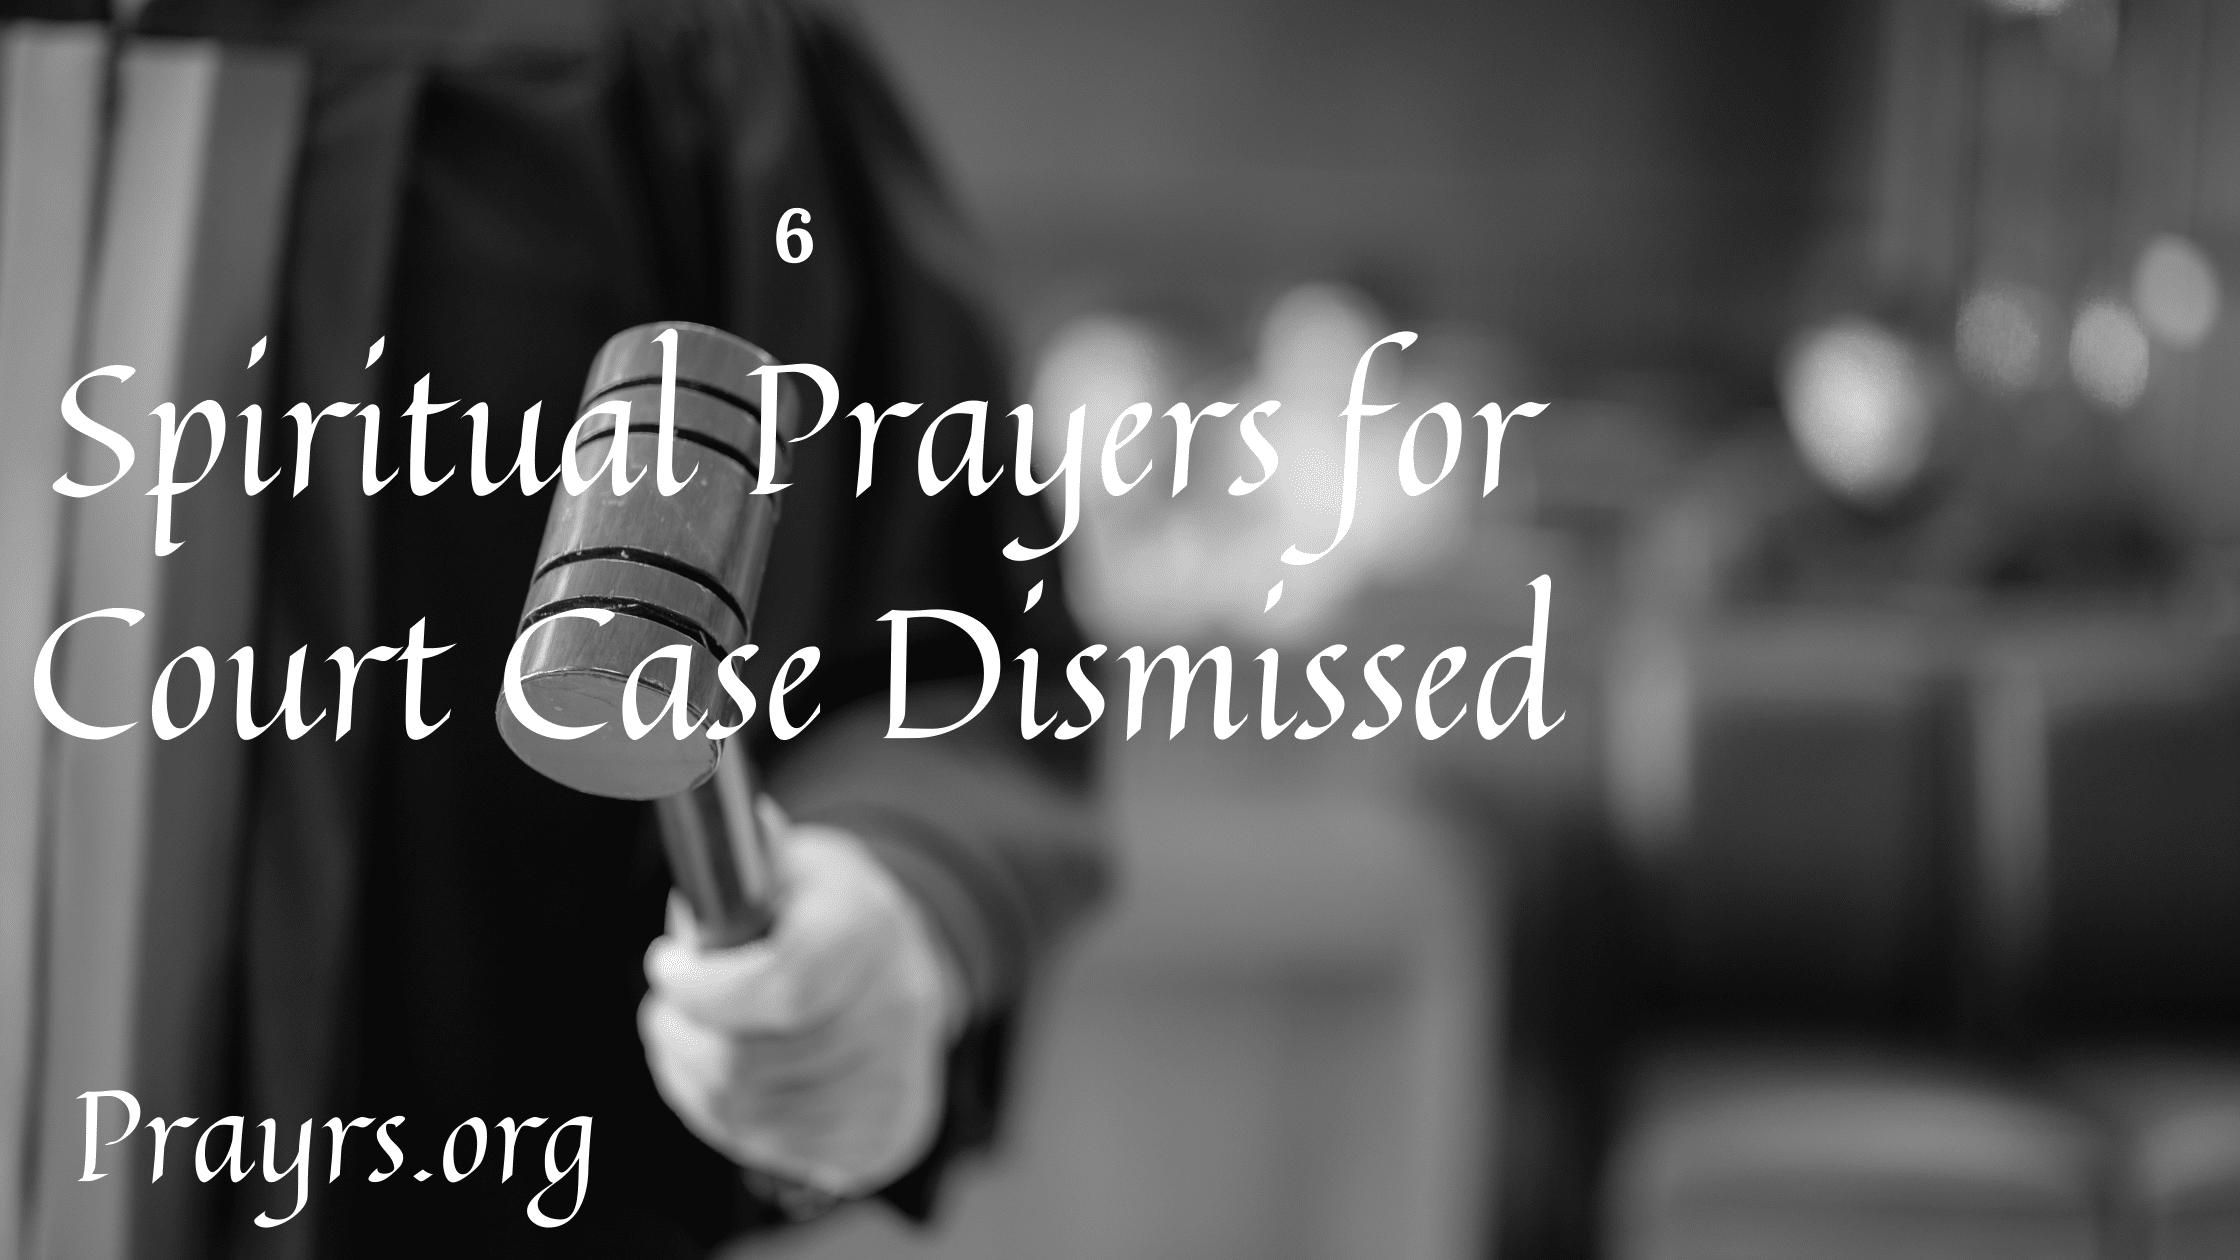 Spiritual Prayers for Court Case Dismissed